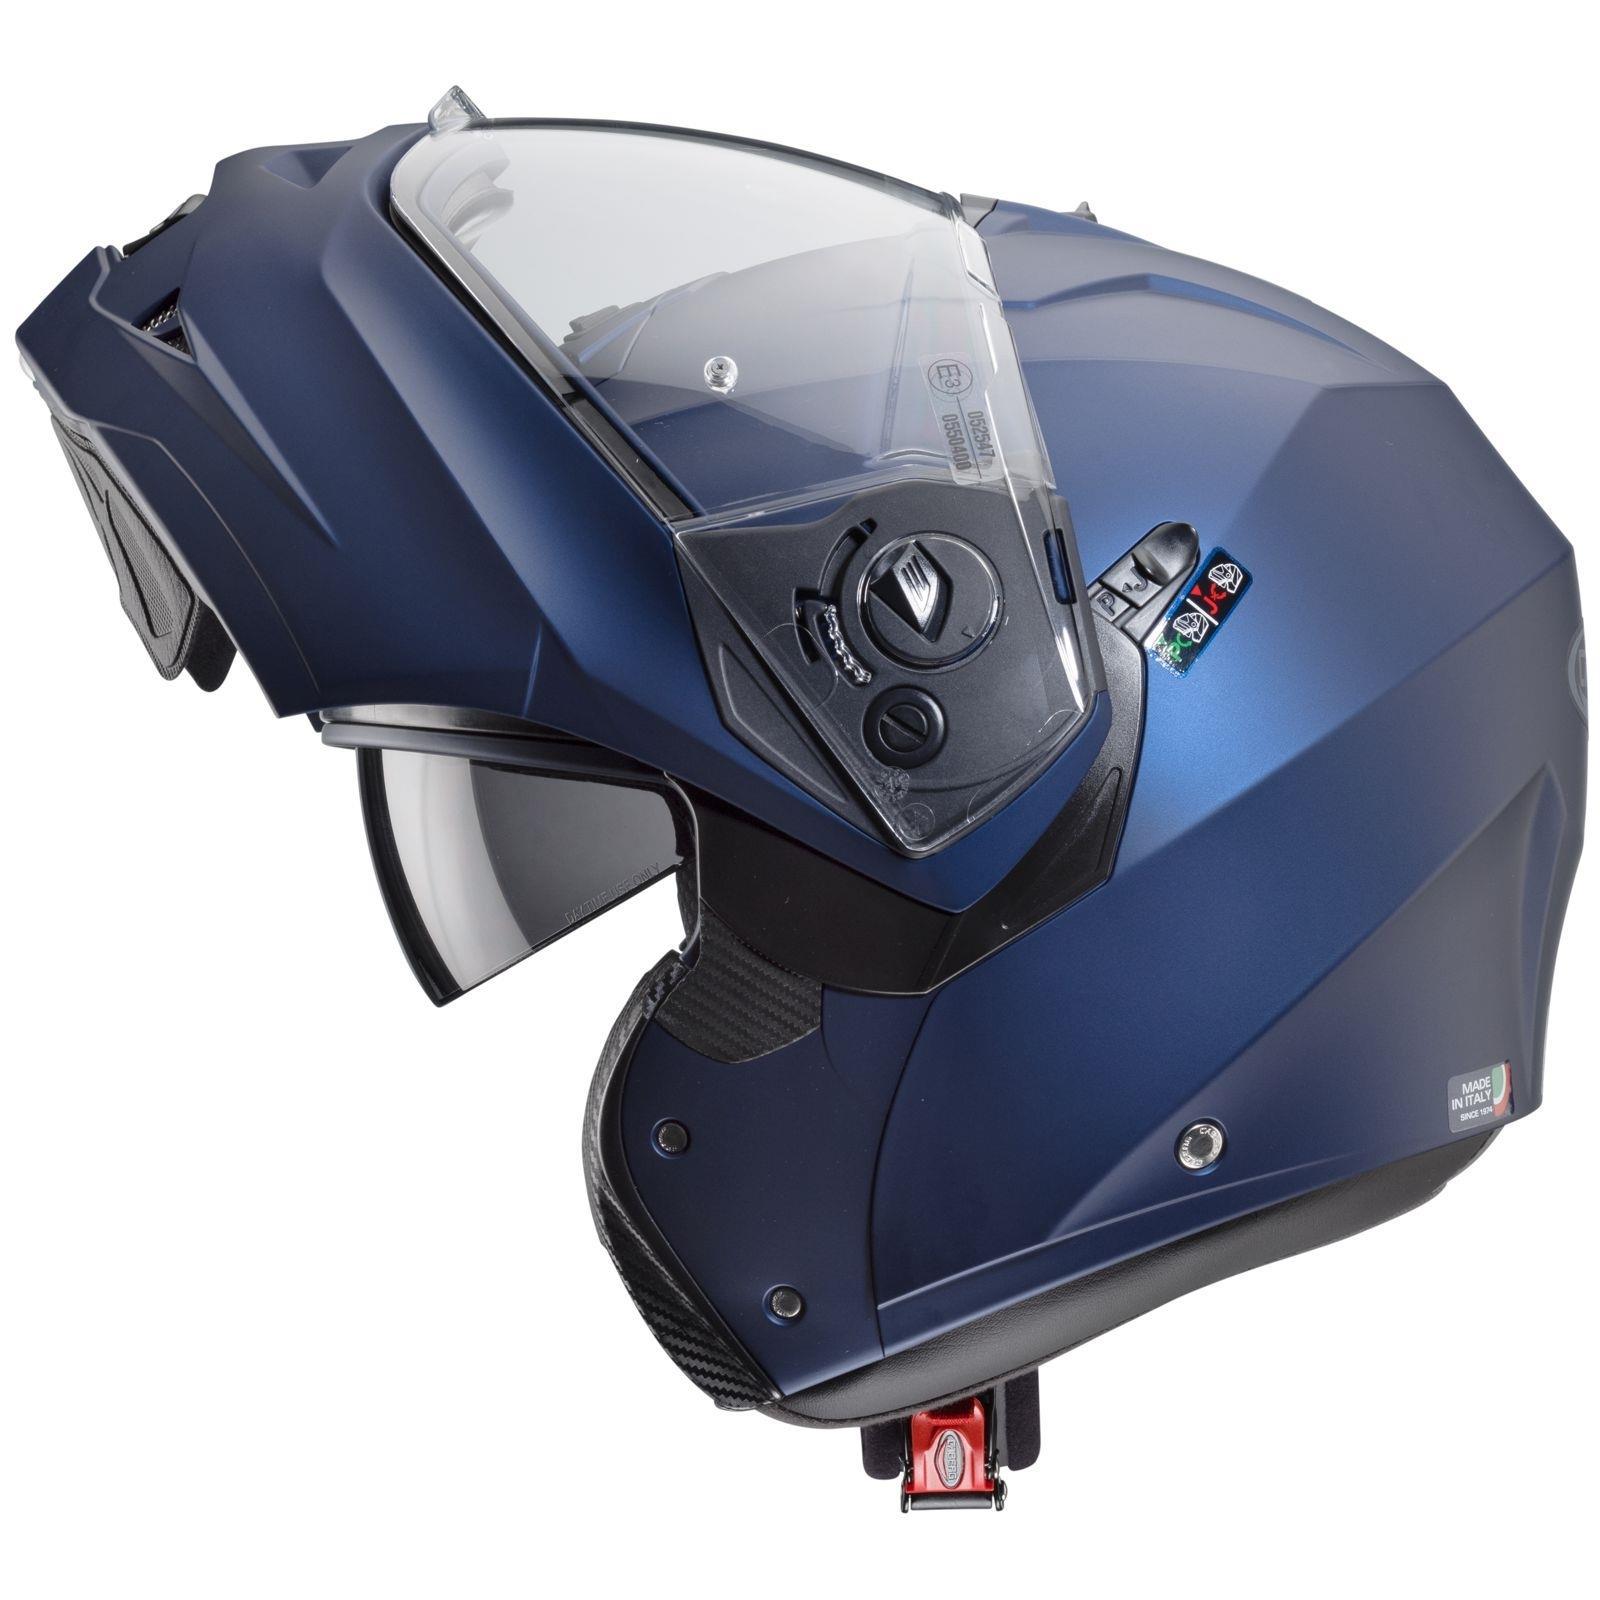 Caberg-Klapp-Helm-Duke-II-2-Motorrad-Belueftet-Sonnenblende-Pinlock-Visier-Jet Indexbild 11